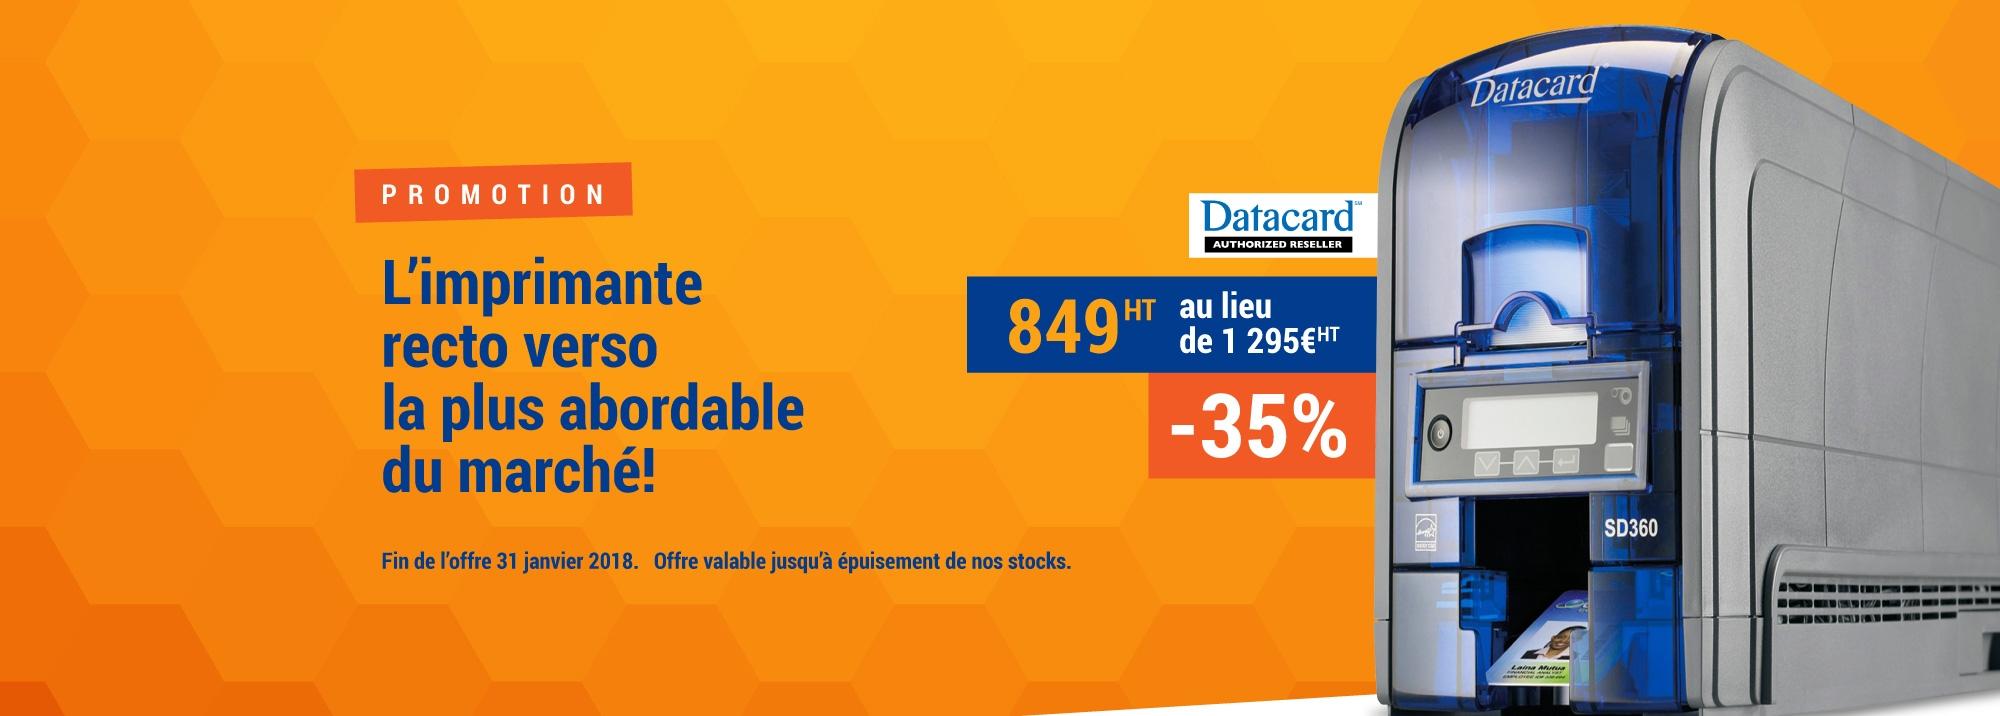 Promotion SD360 duplex